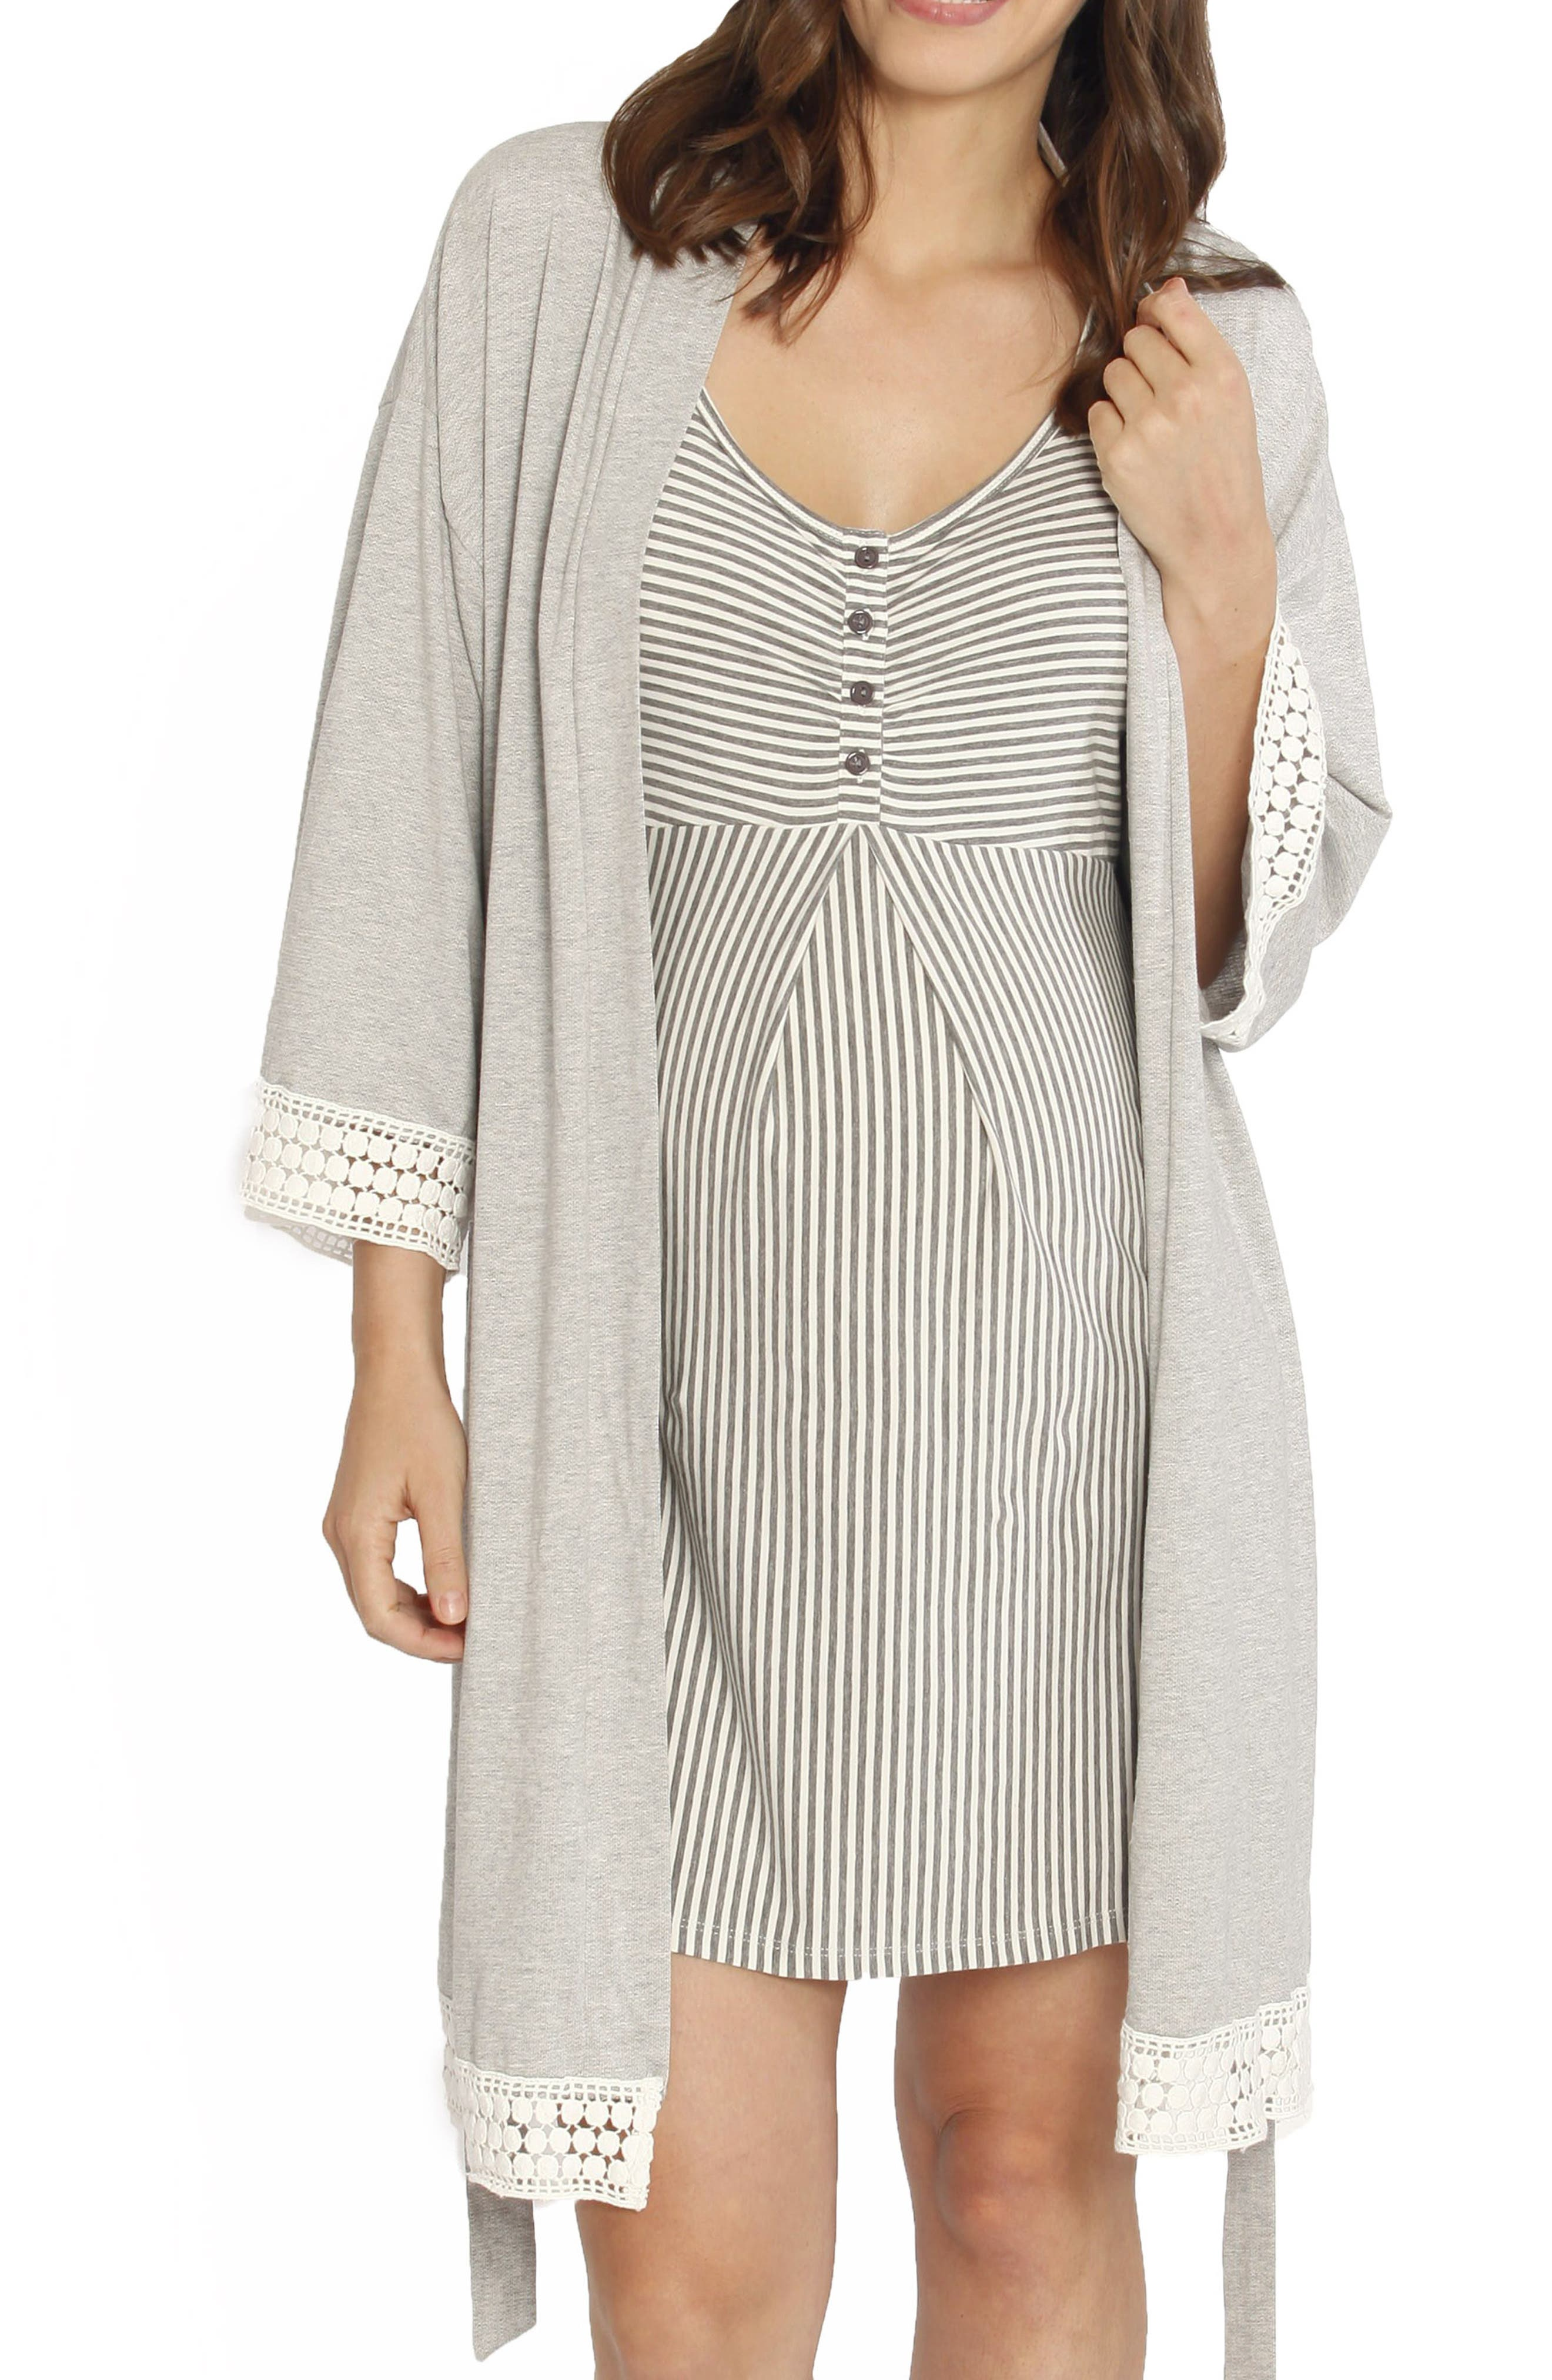 Nursing/Maternity Dress, Robe & Baby Wrap Set,                         Main,                         color, GREY/ WHITE